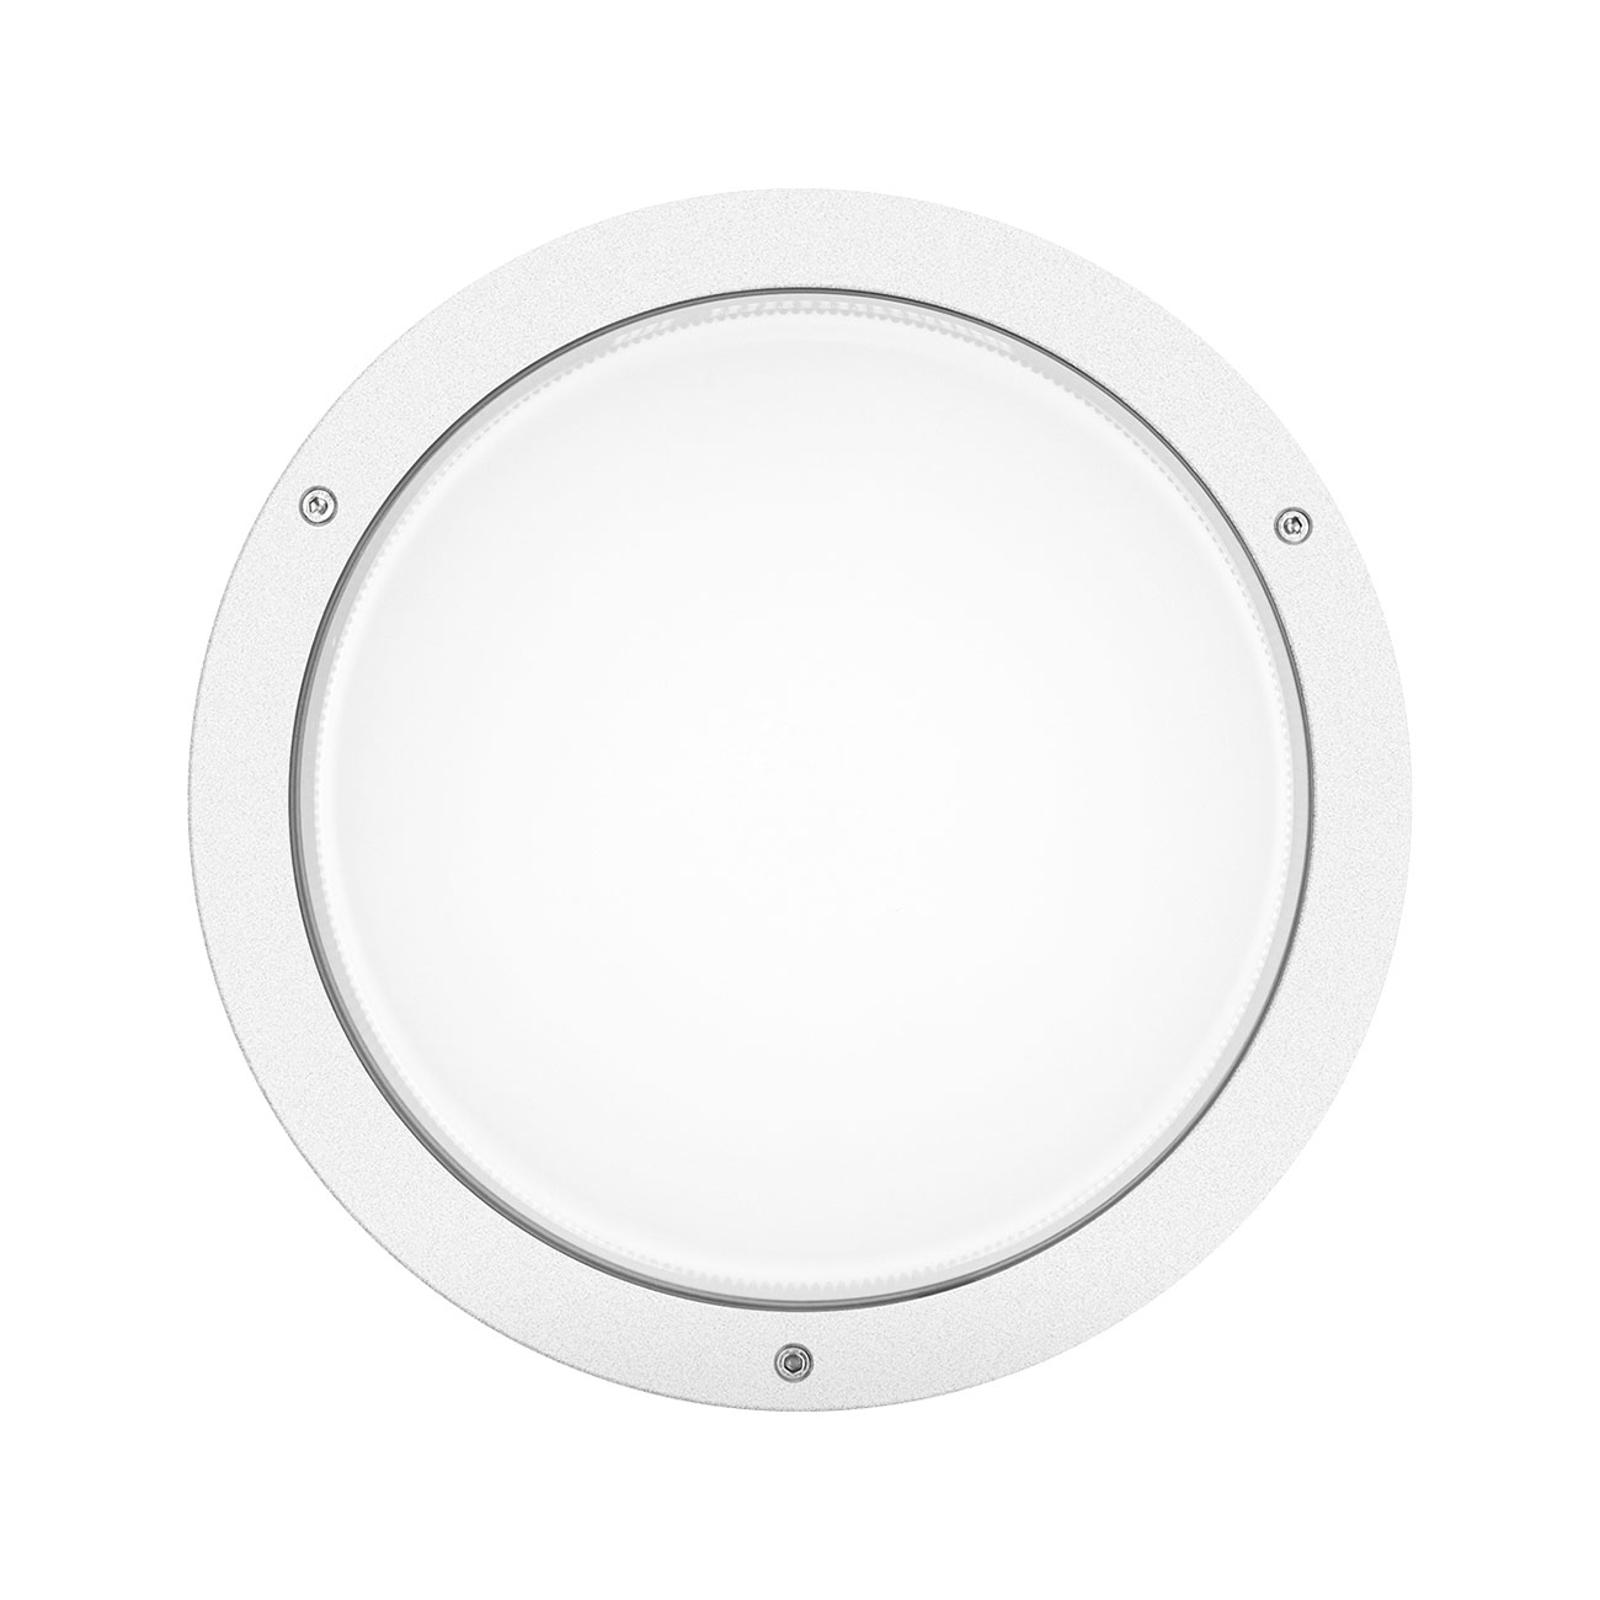 Applique LED Bliz Round 30 3000K blanche dimmable